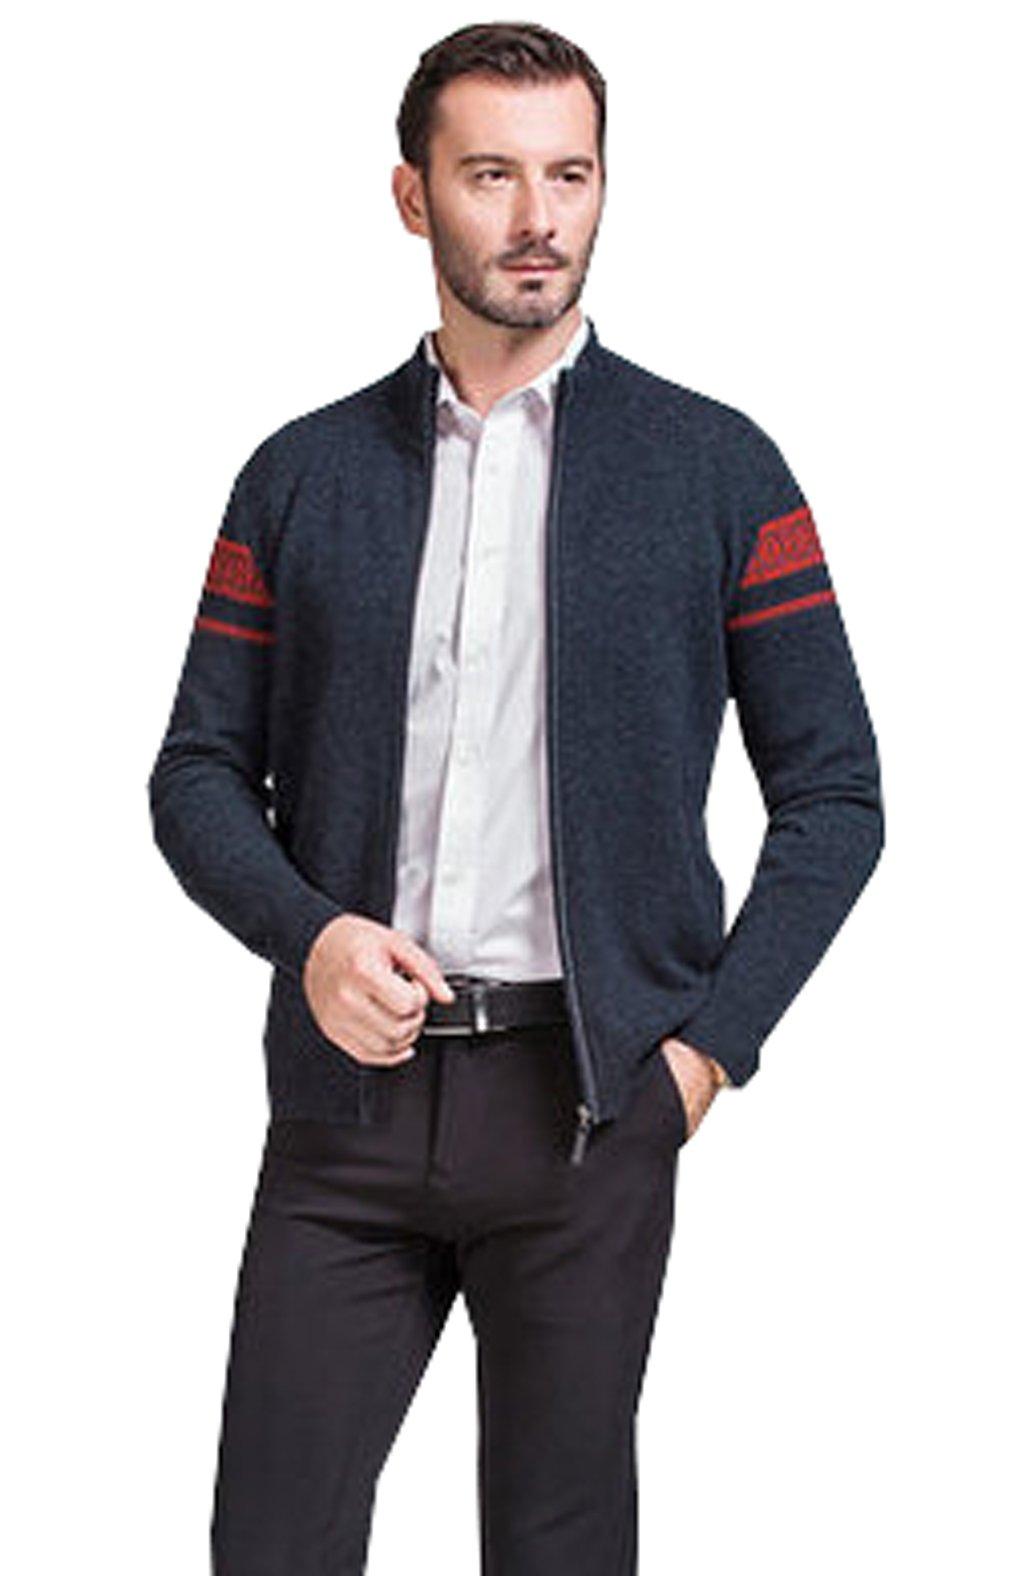 METERDE Men's Premium Zip Through Printed Knit Cardigan Deep Grey L